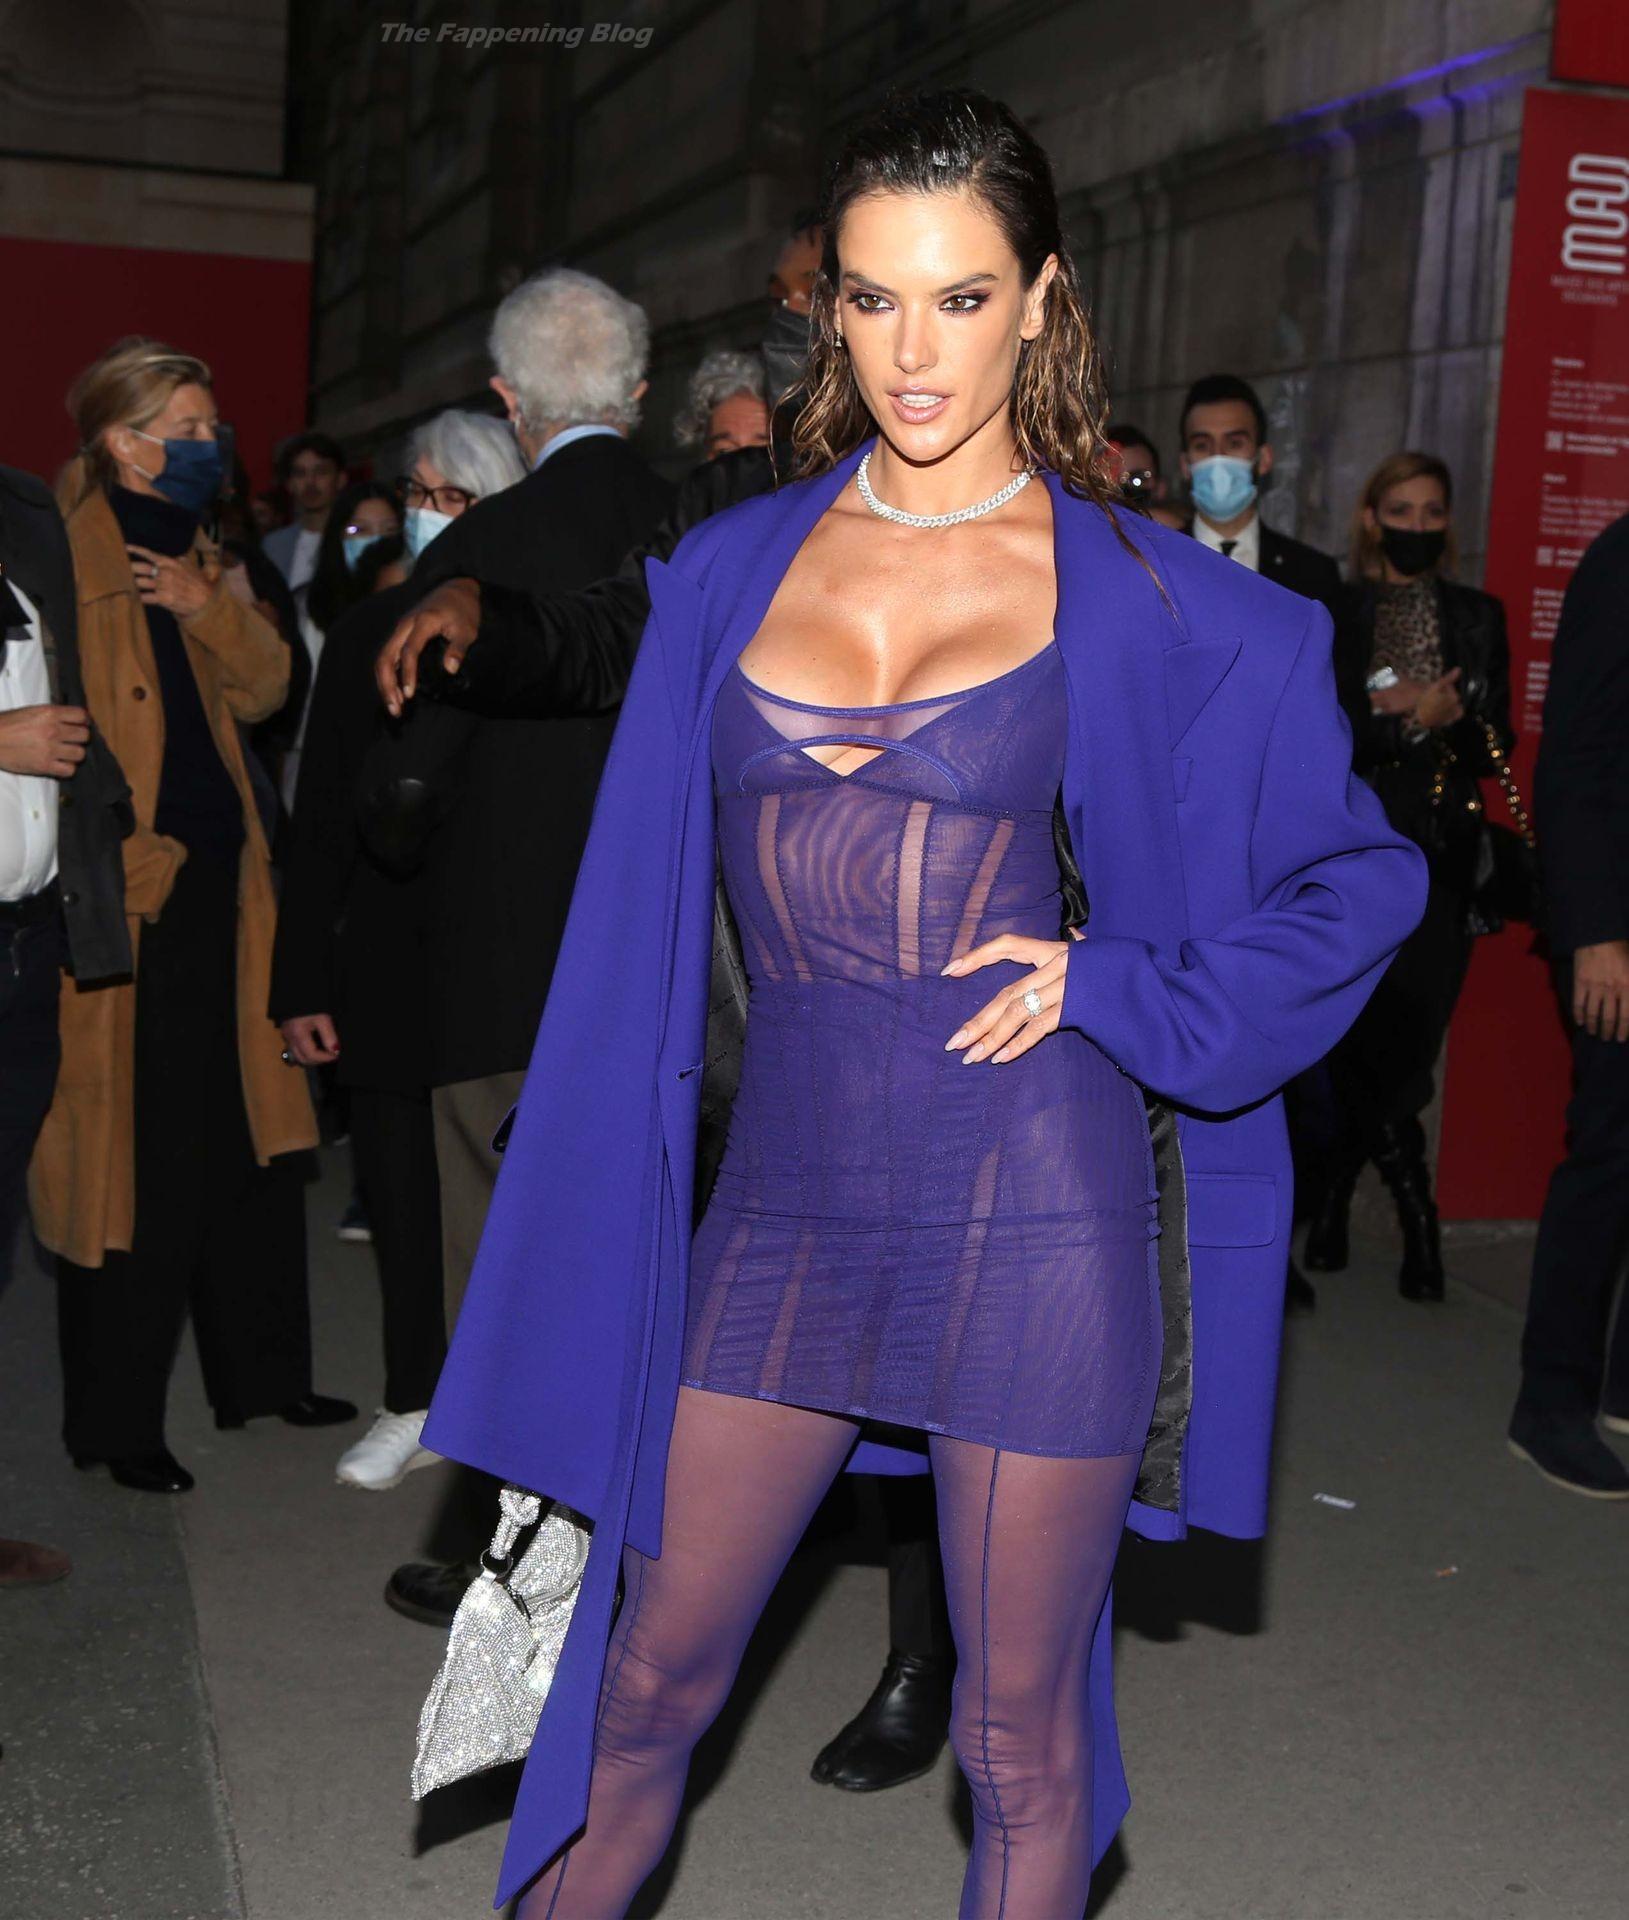 Alessandra-Ambrosio-Sexy-The-Fappening-Blog-44-1.jpg